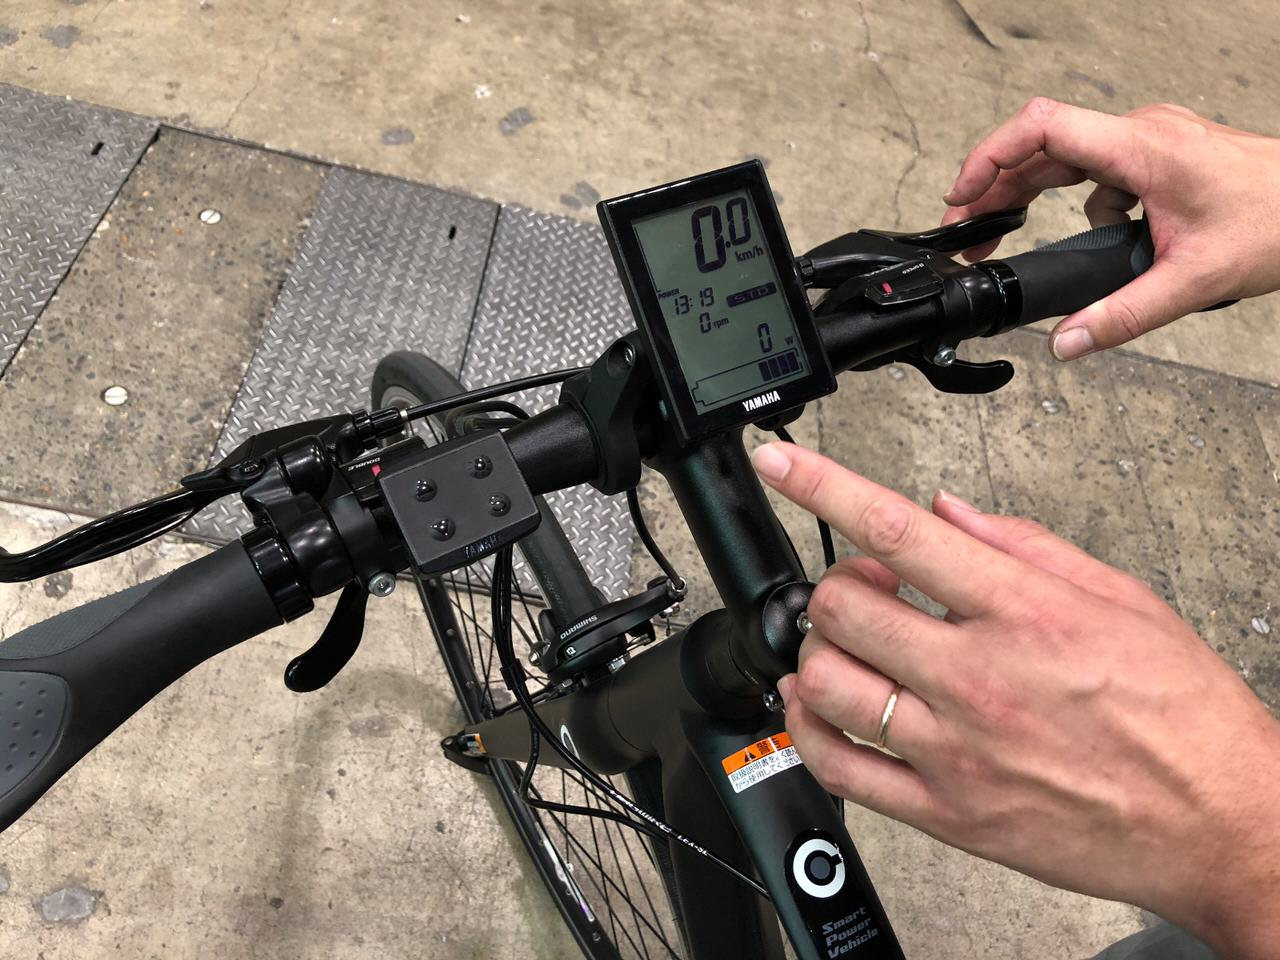 Cyclemode 0456